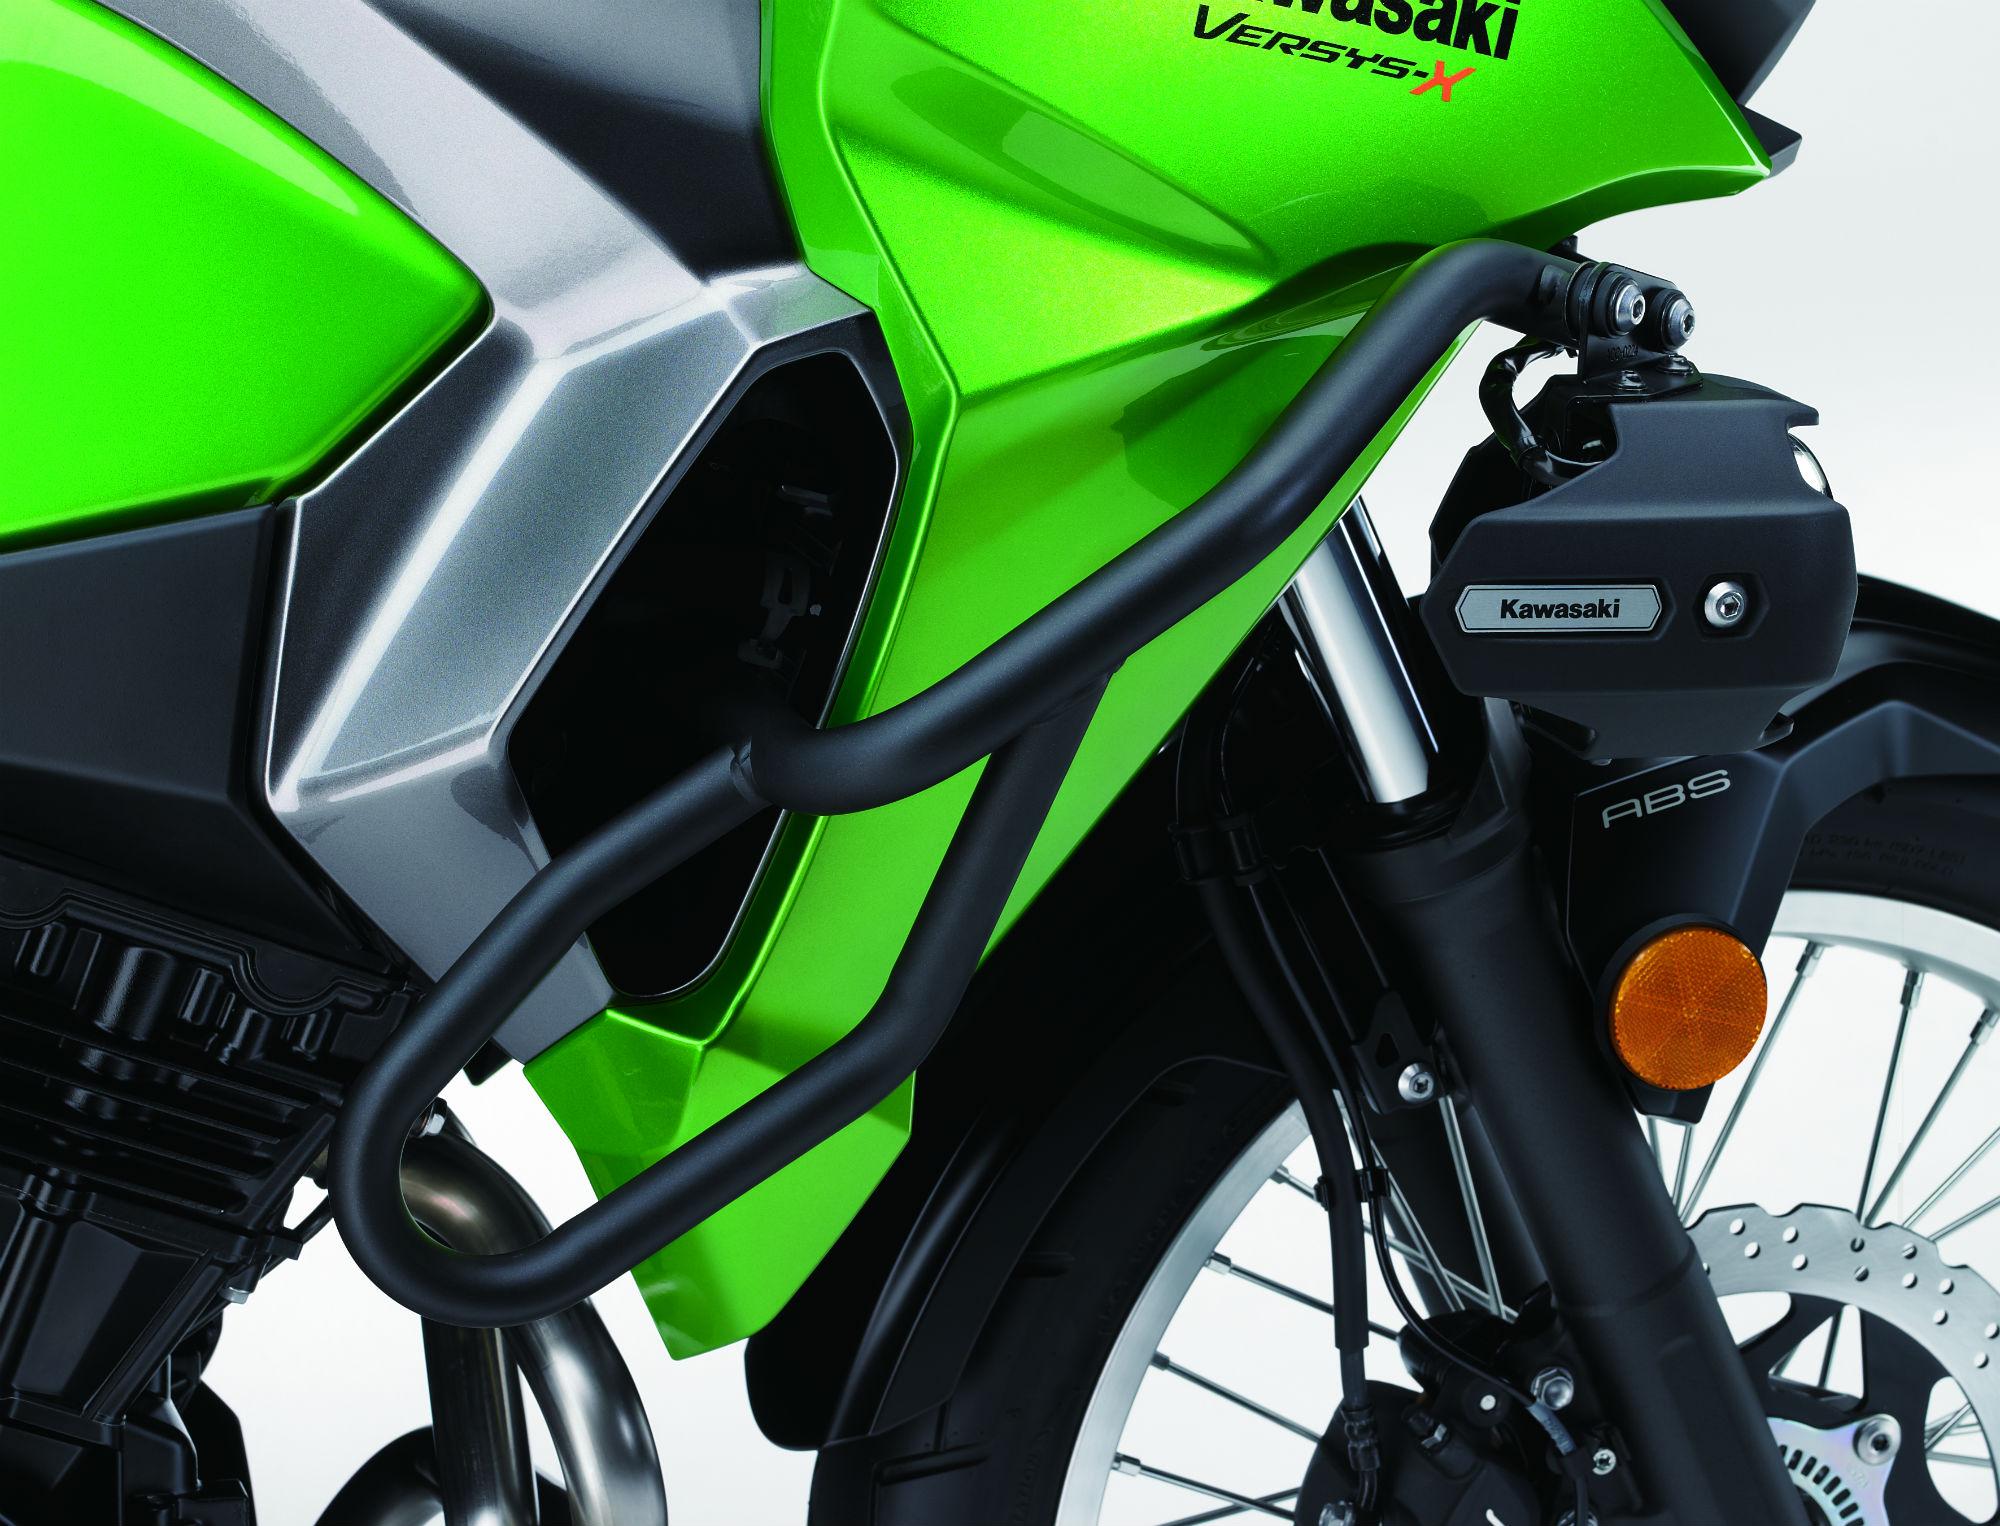 New Kawasaki Versys X 300 Visordown